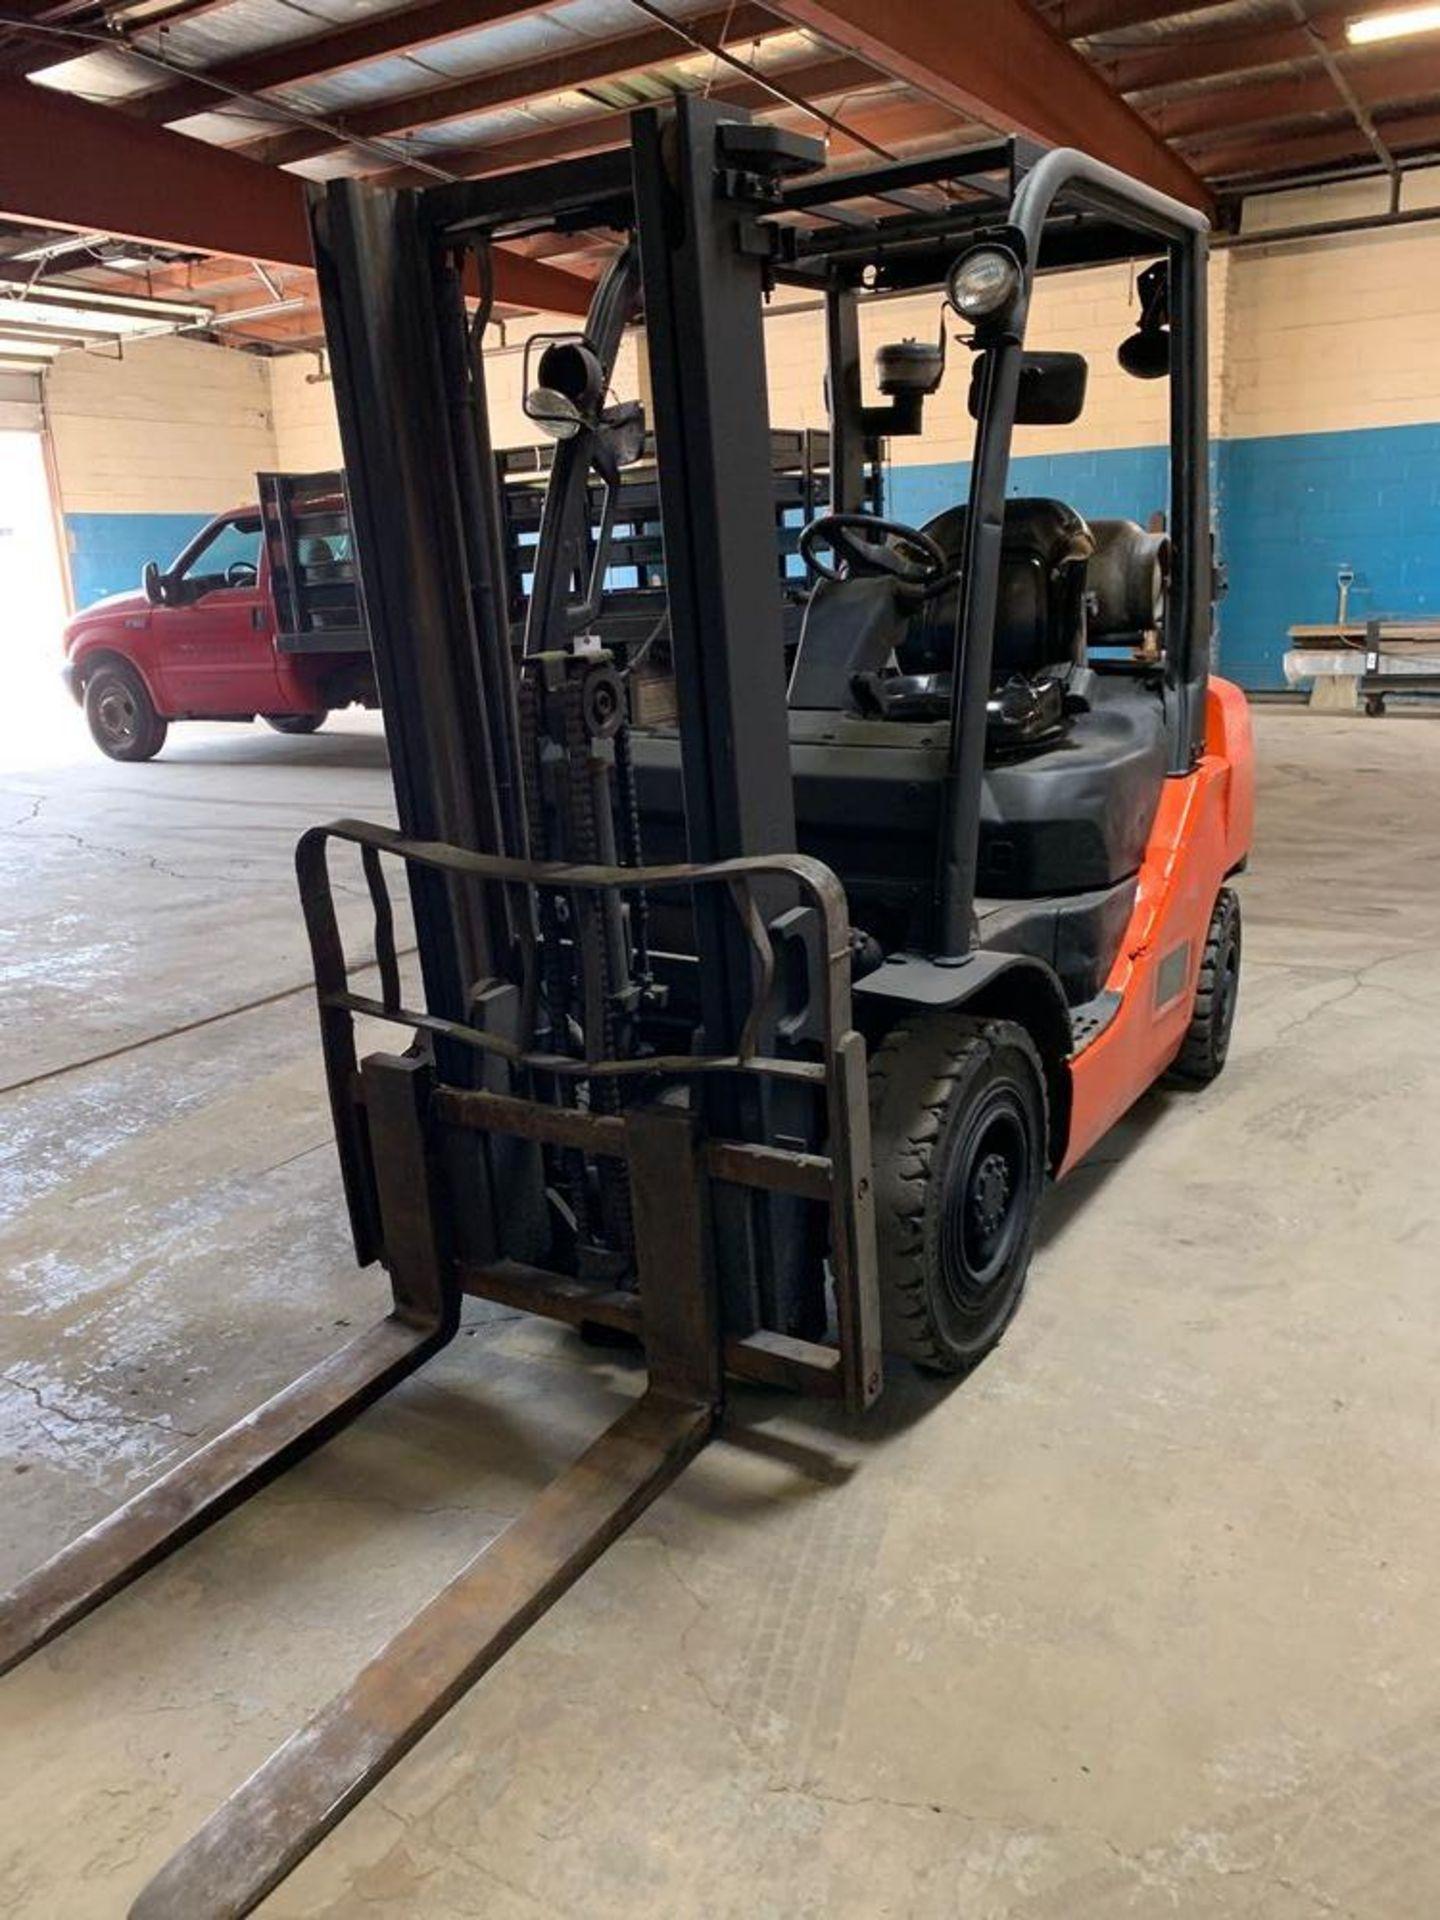 Lot 38 - 5,000 Totota Forklift Model 8FGU25, Propane Tank NOT Included, s/n: 12916